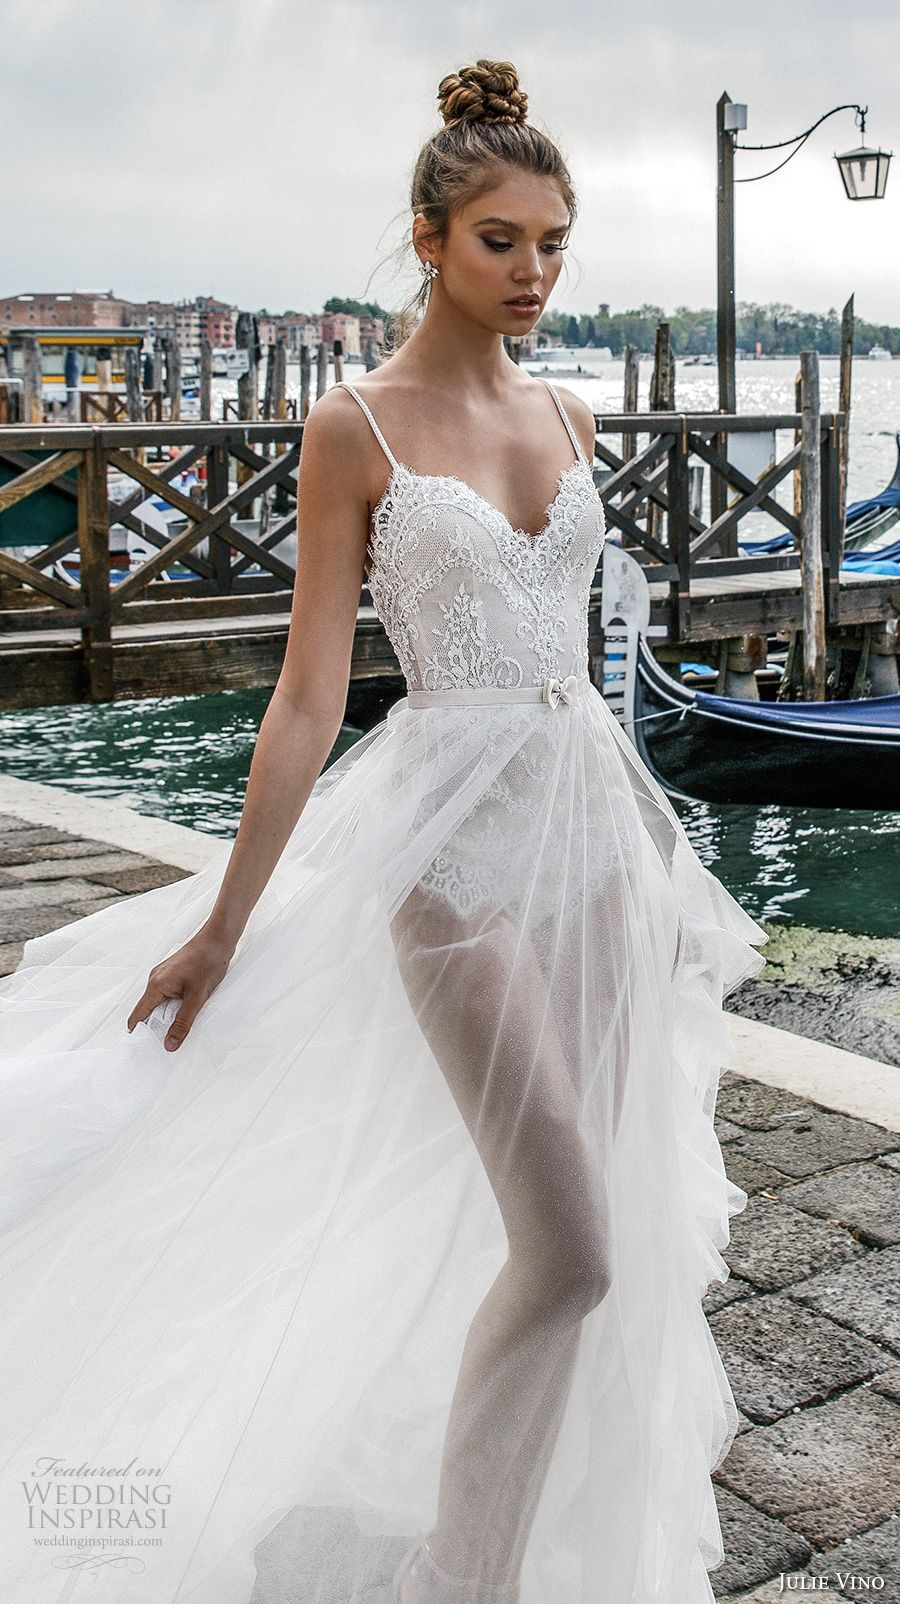 julie vino spring 2018 wedding dresses venezia bridal